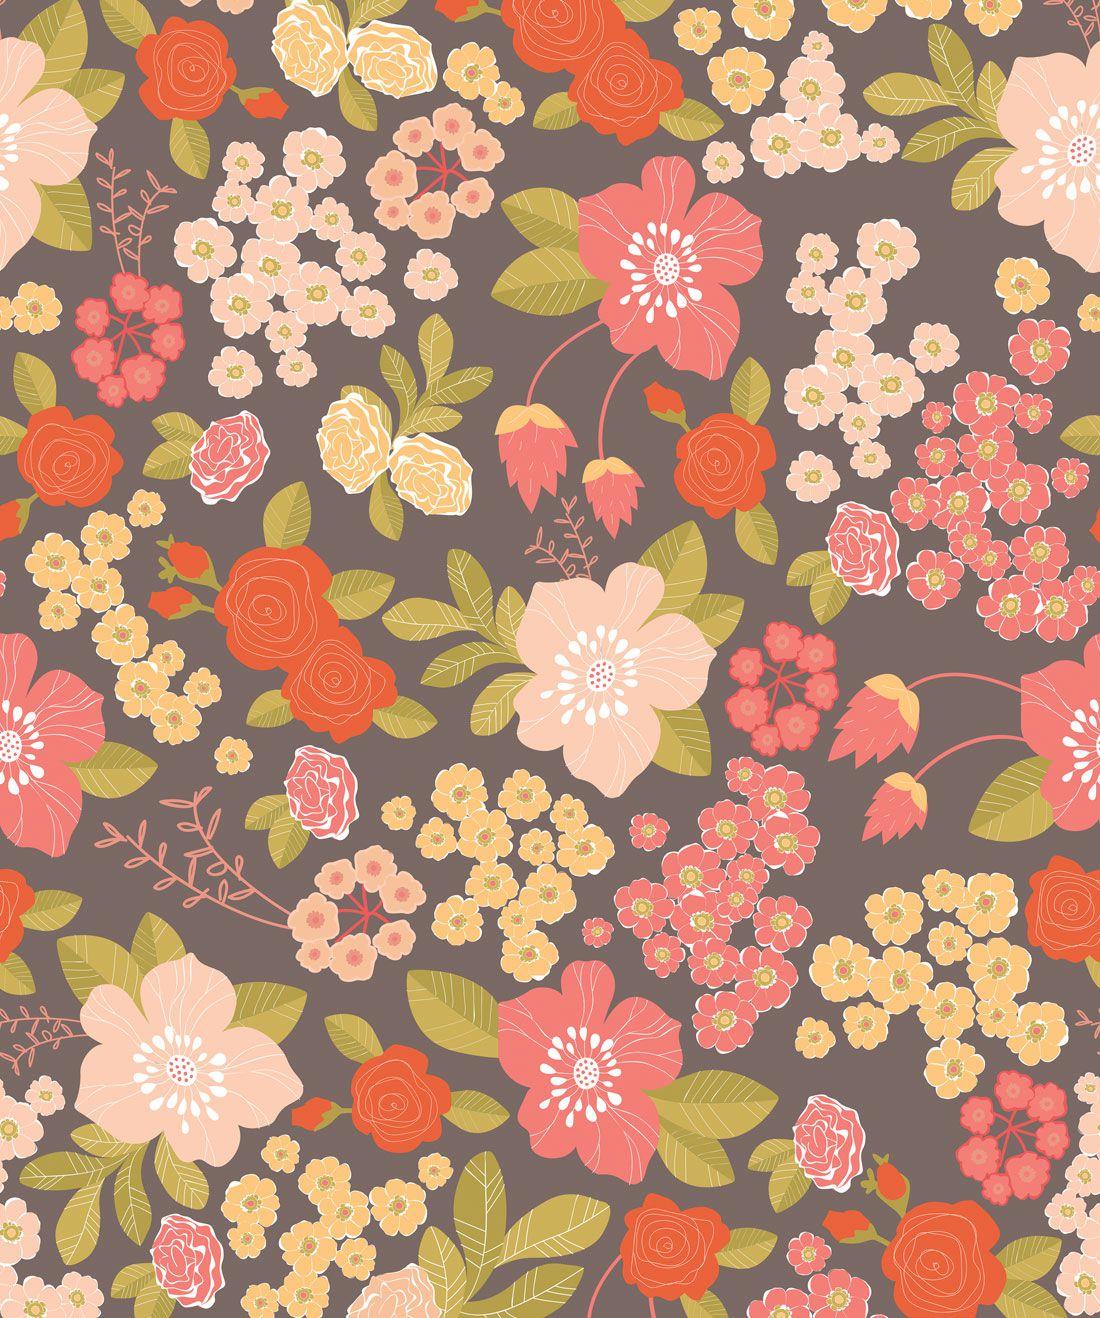 Stormy Bouquet Wallpaper